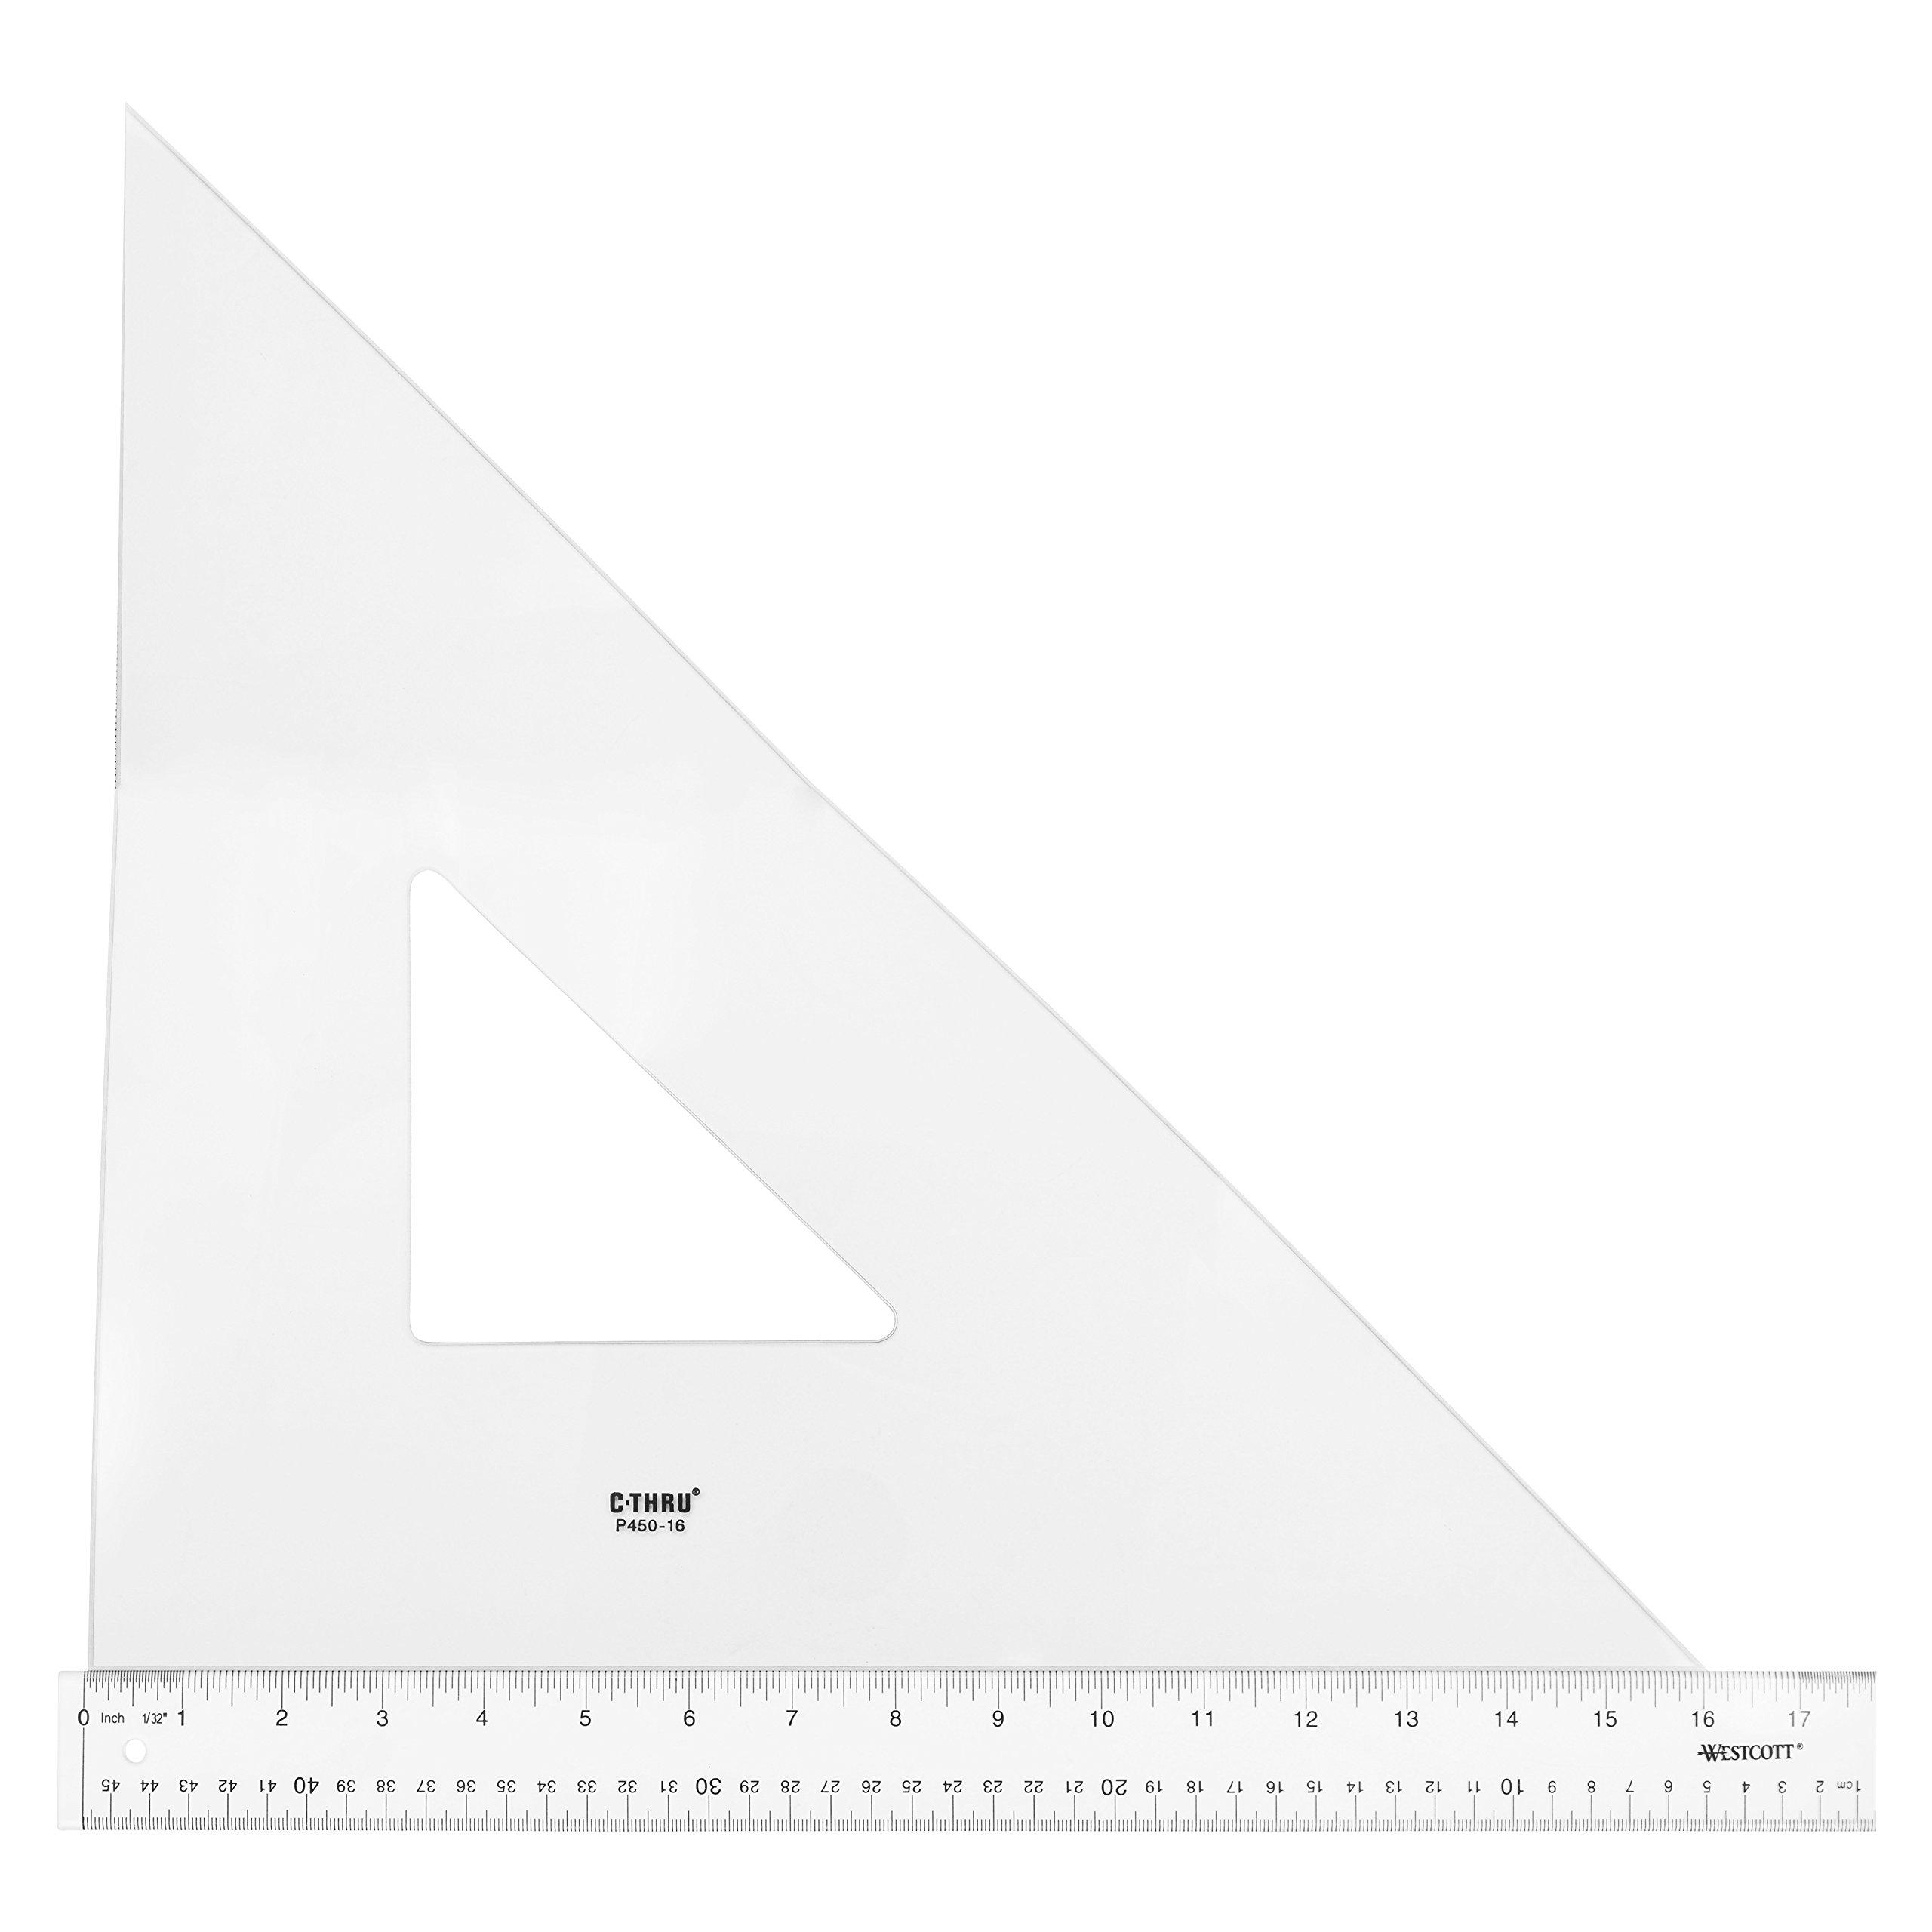 Westcott Professional Triangle, 16'', 45/90 Degree, Transparent (P450-16)